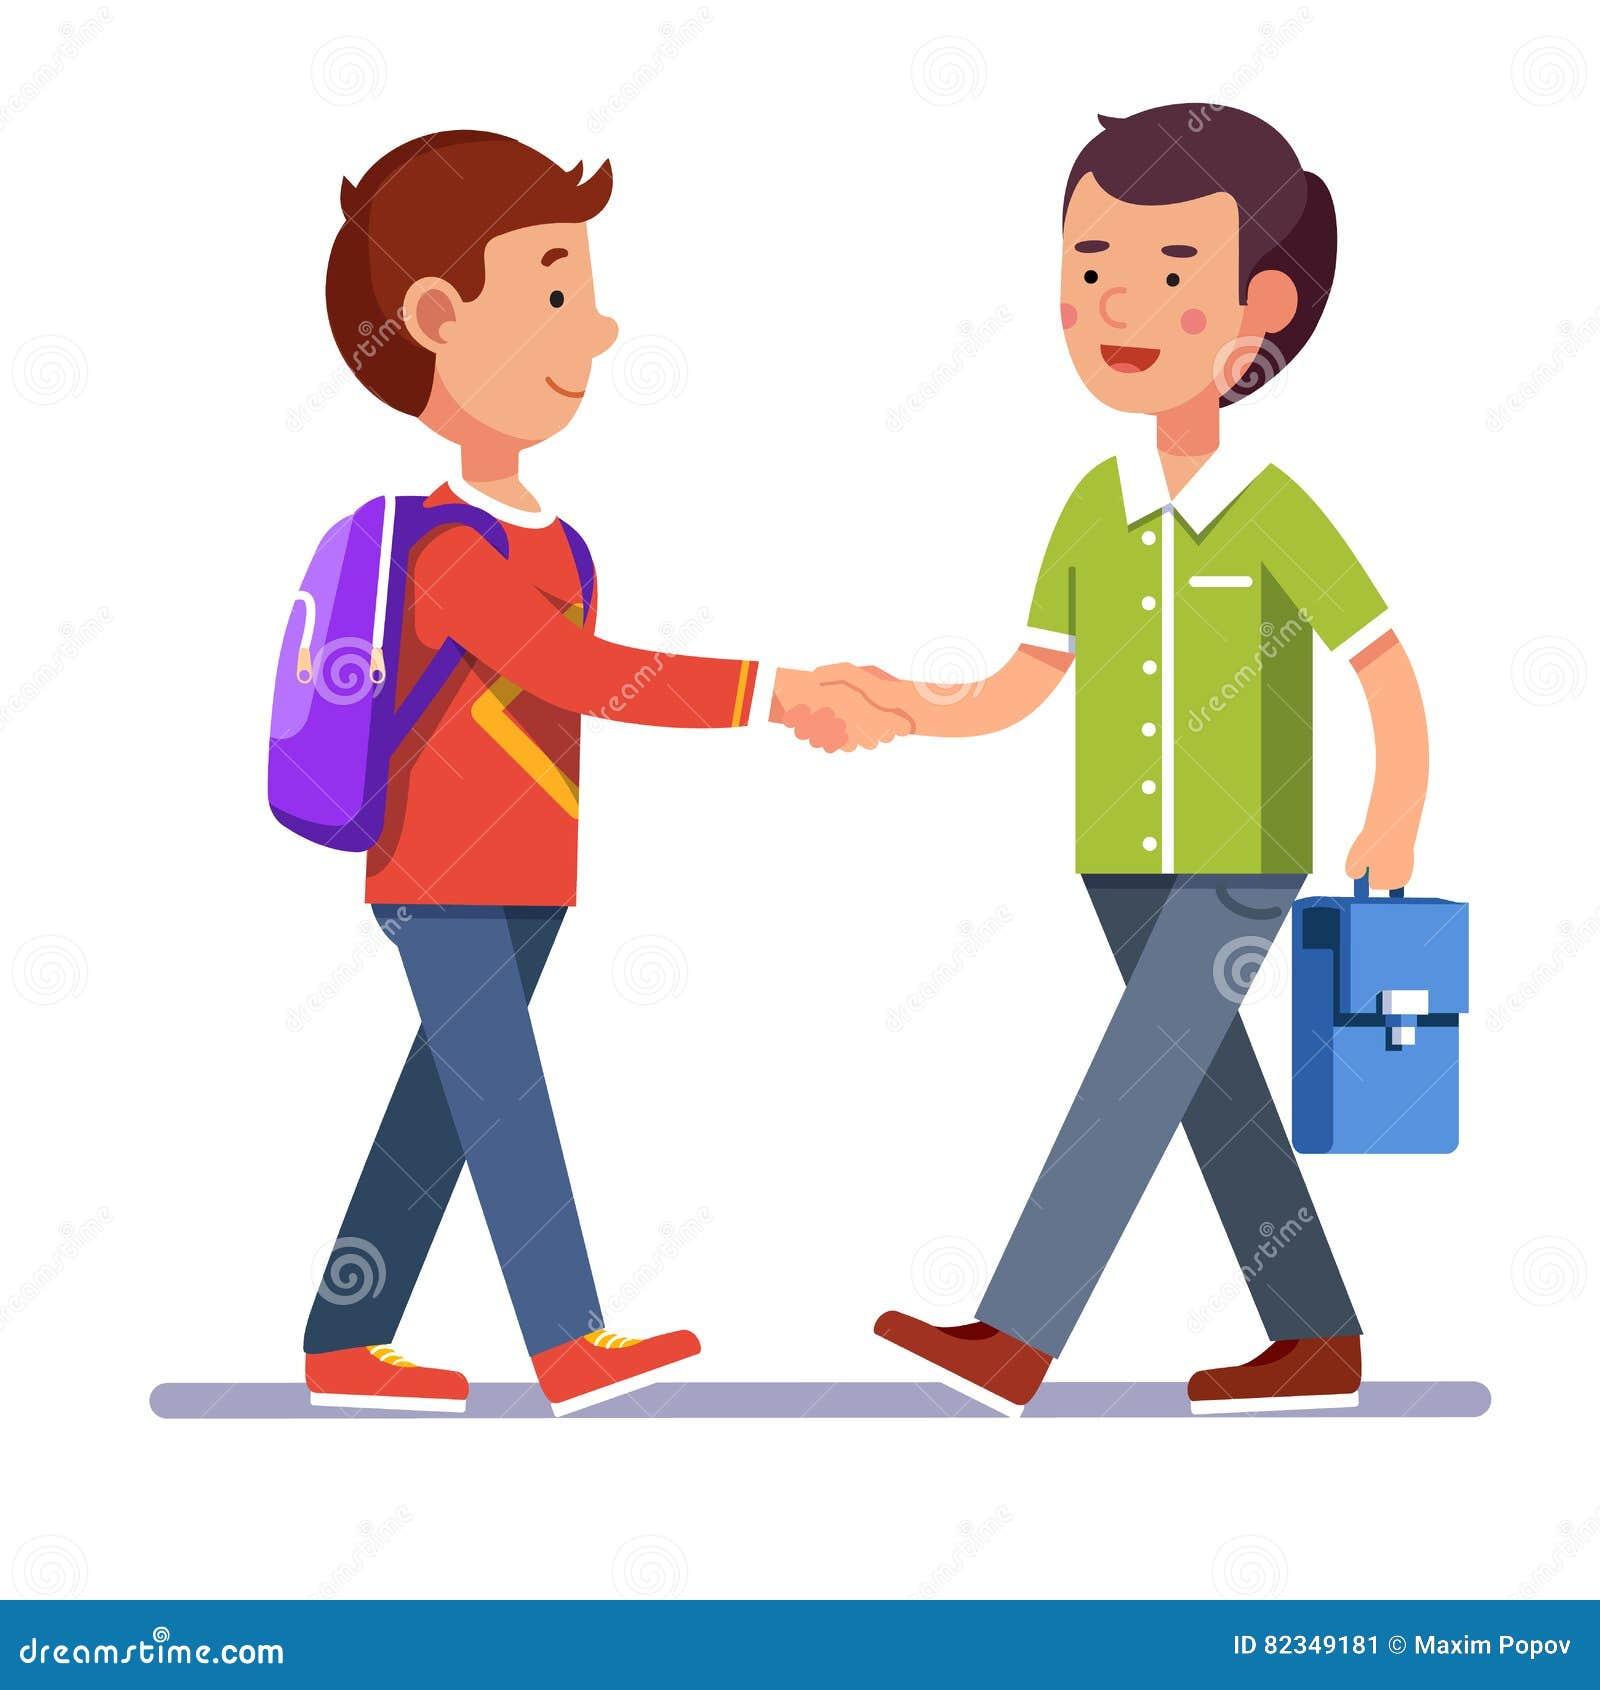 children handshake clipart - photo #40